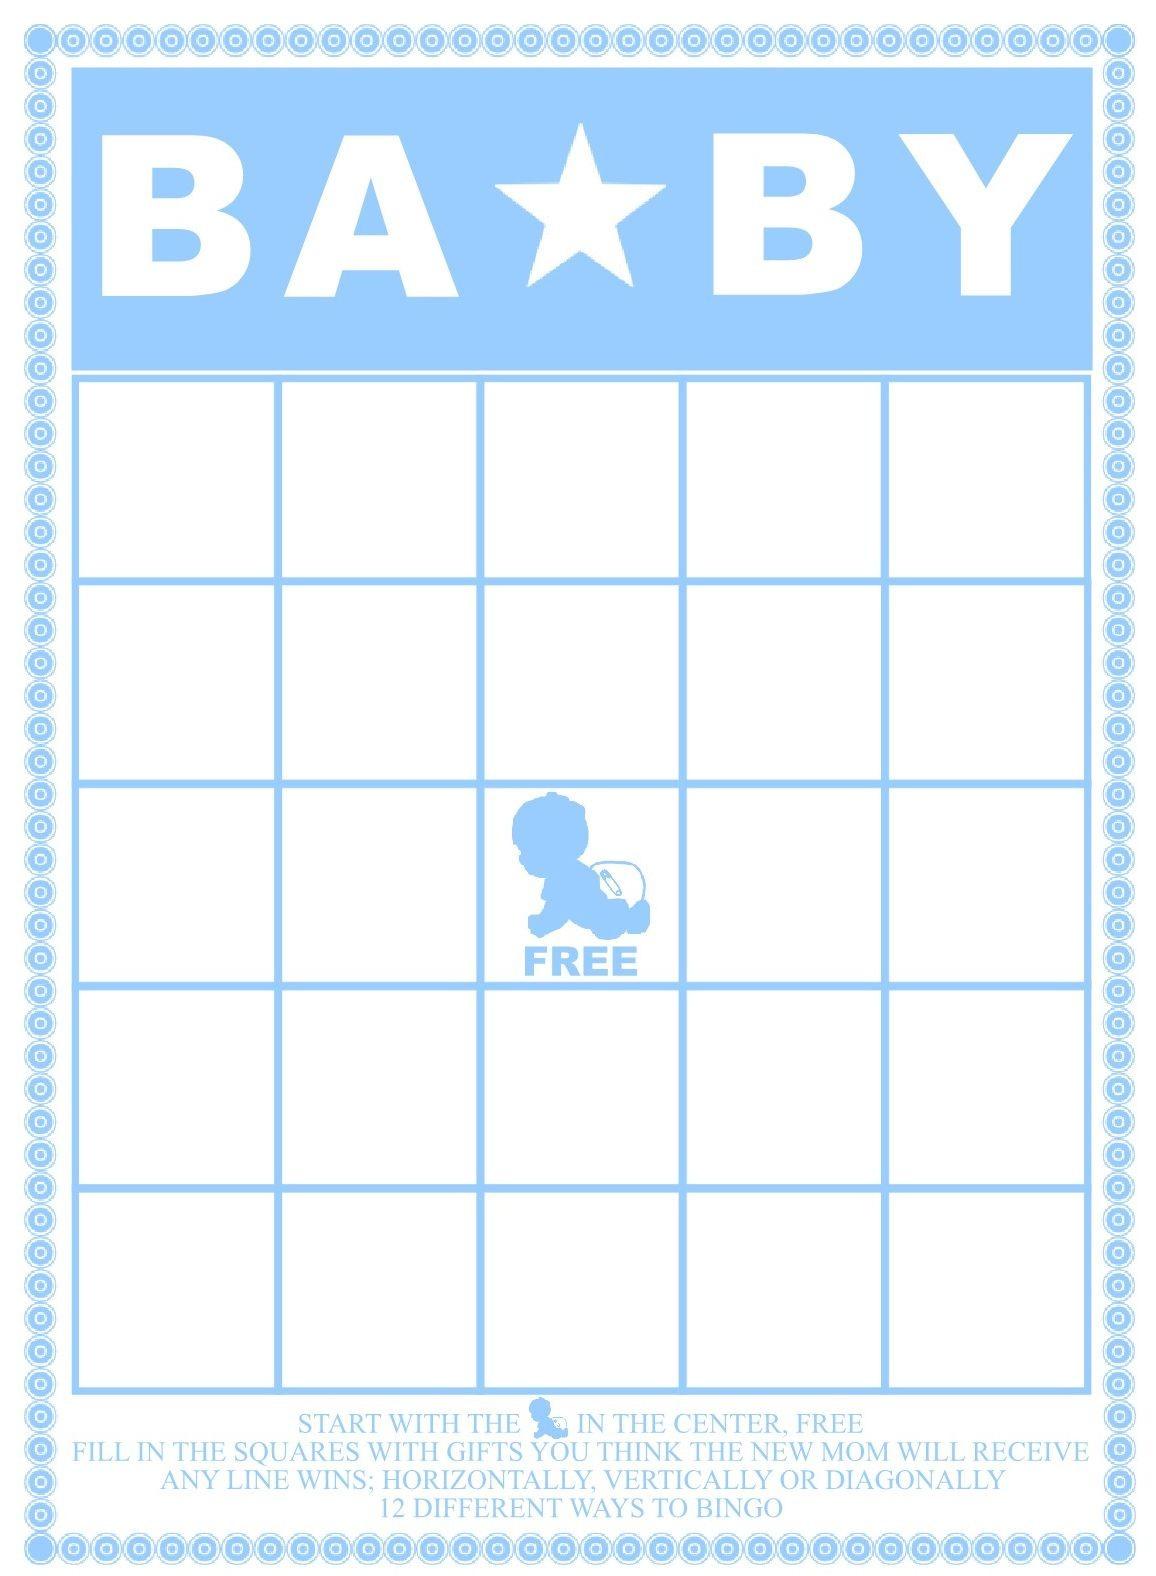 Baby Bingo Template | Madinbelgrade - Baby Bingo Free Printable Template